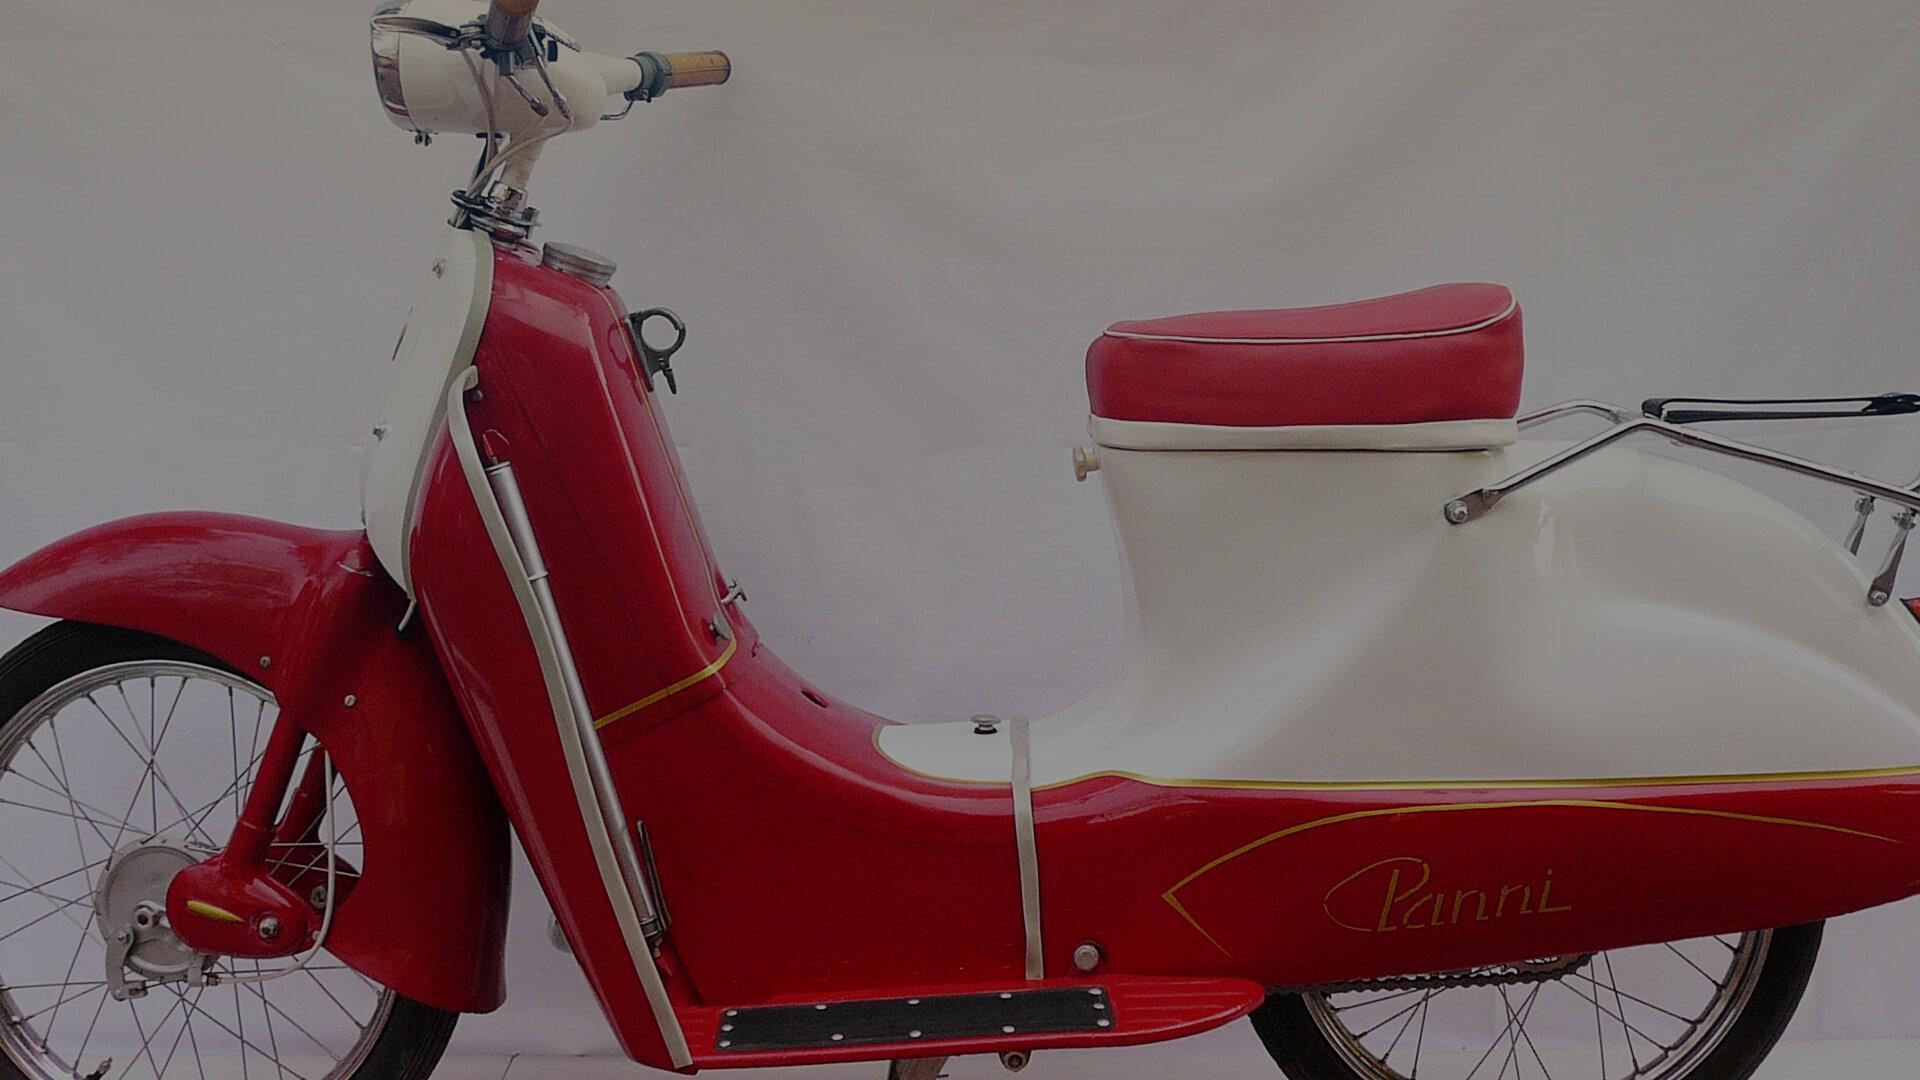 PANNI miniscooter, 49 cc, 1961